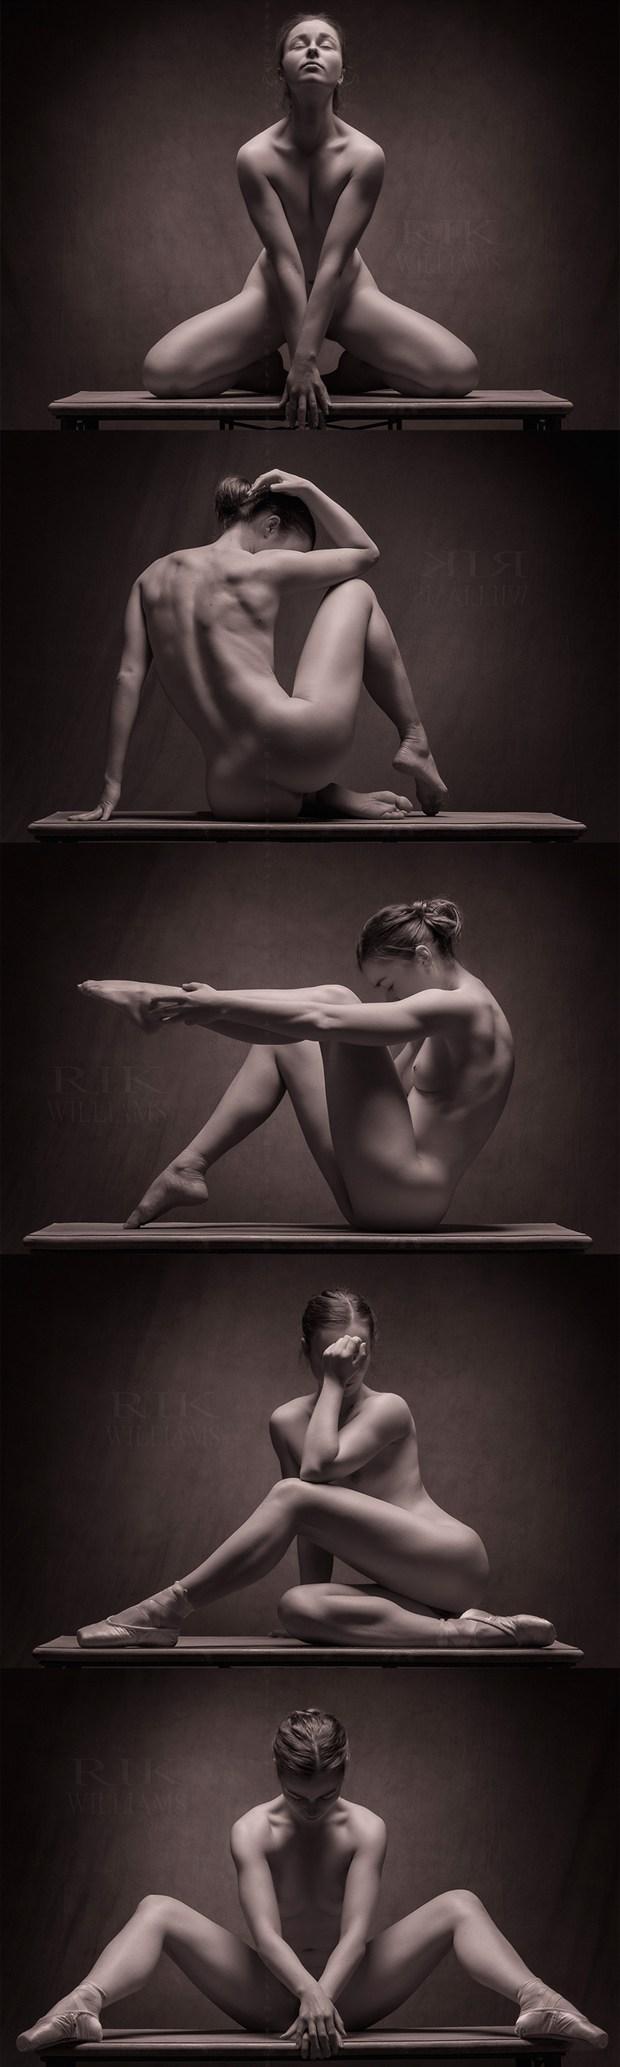 Penny my Ballerina  Artistic Nude Photo by Photographer Rik Williams